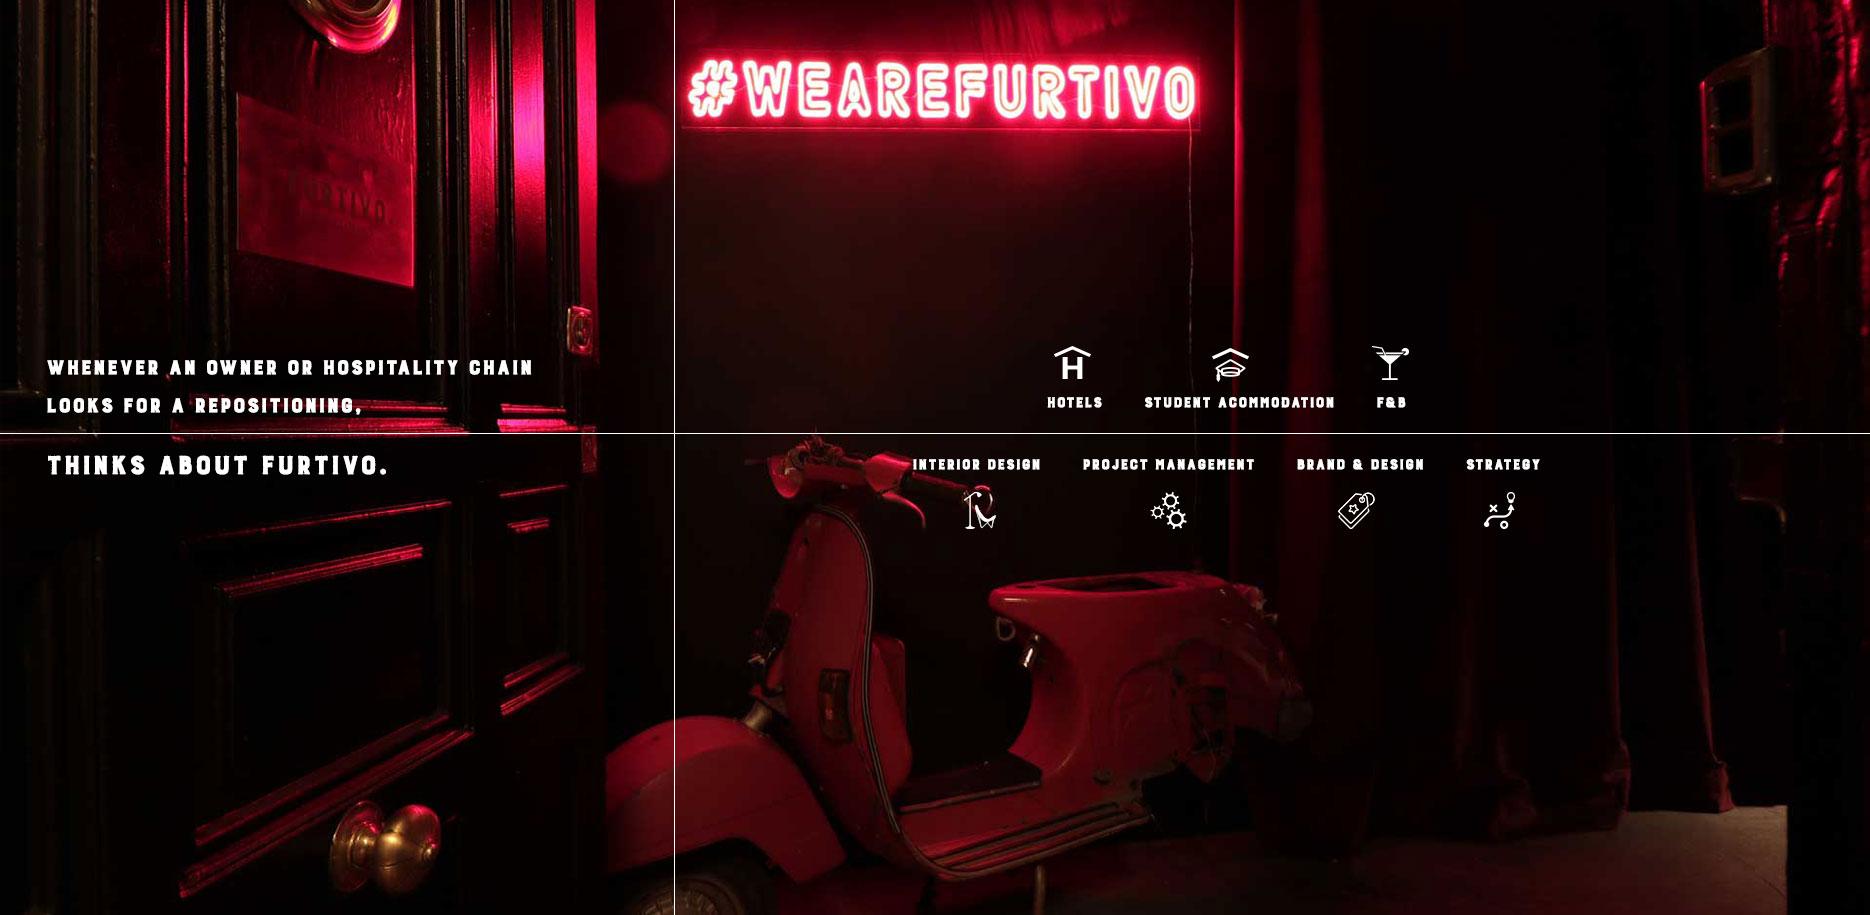 We Are Furtivo